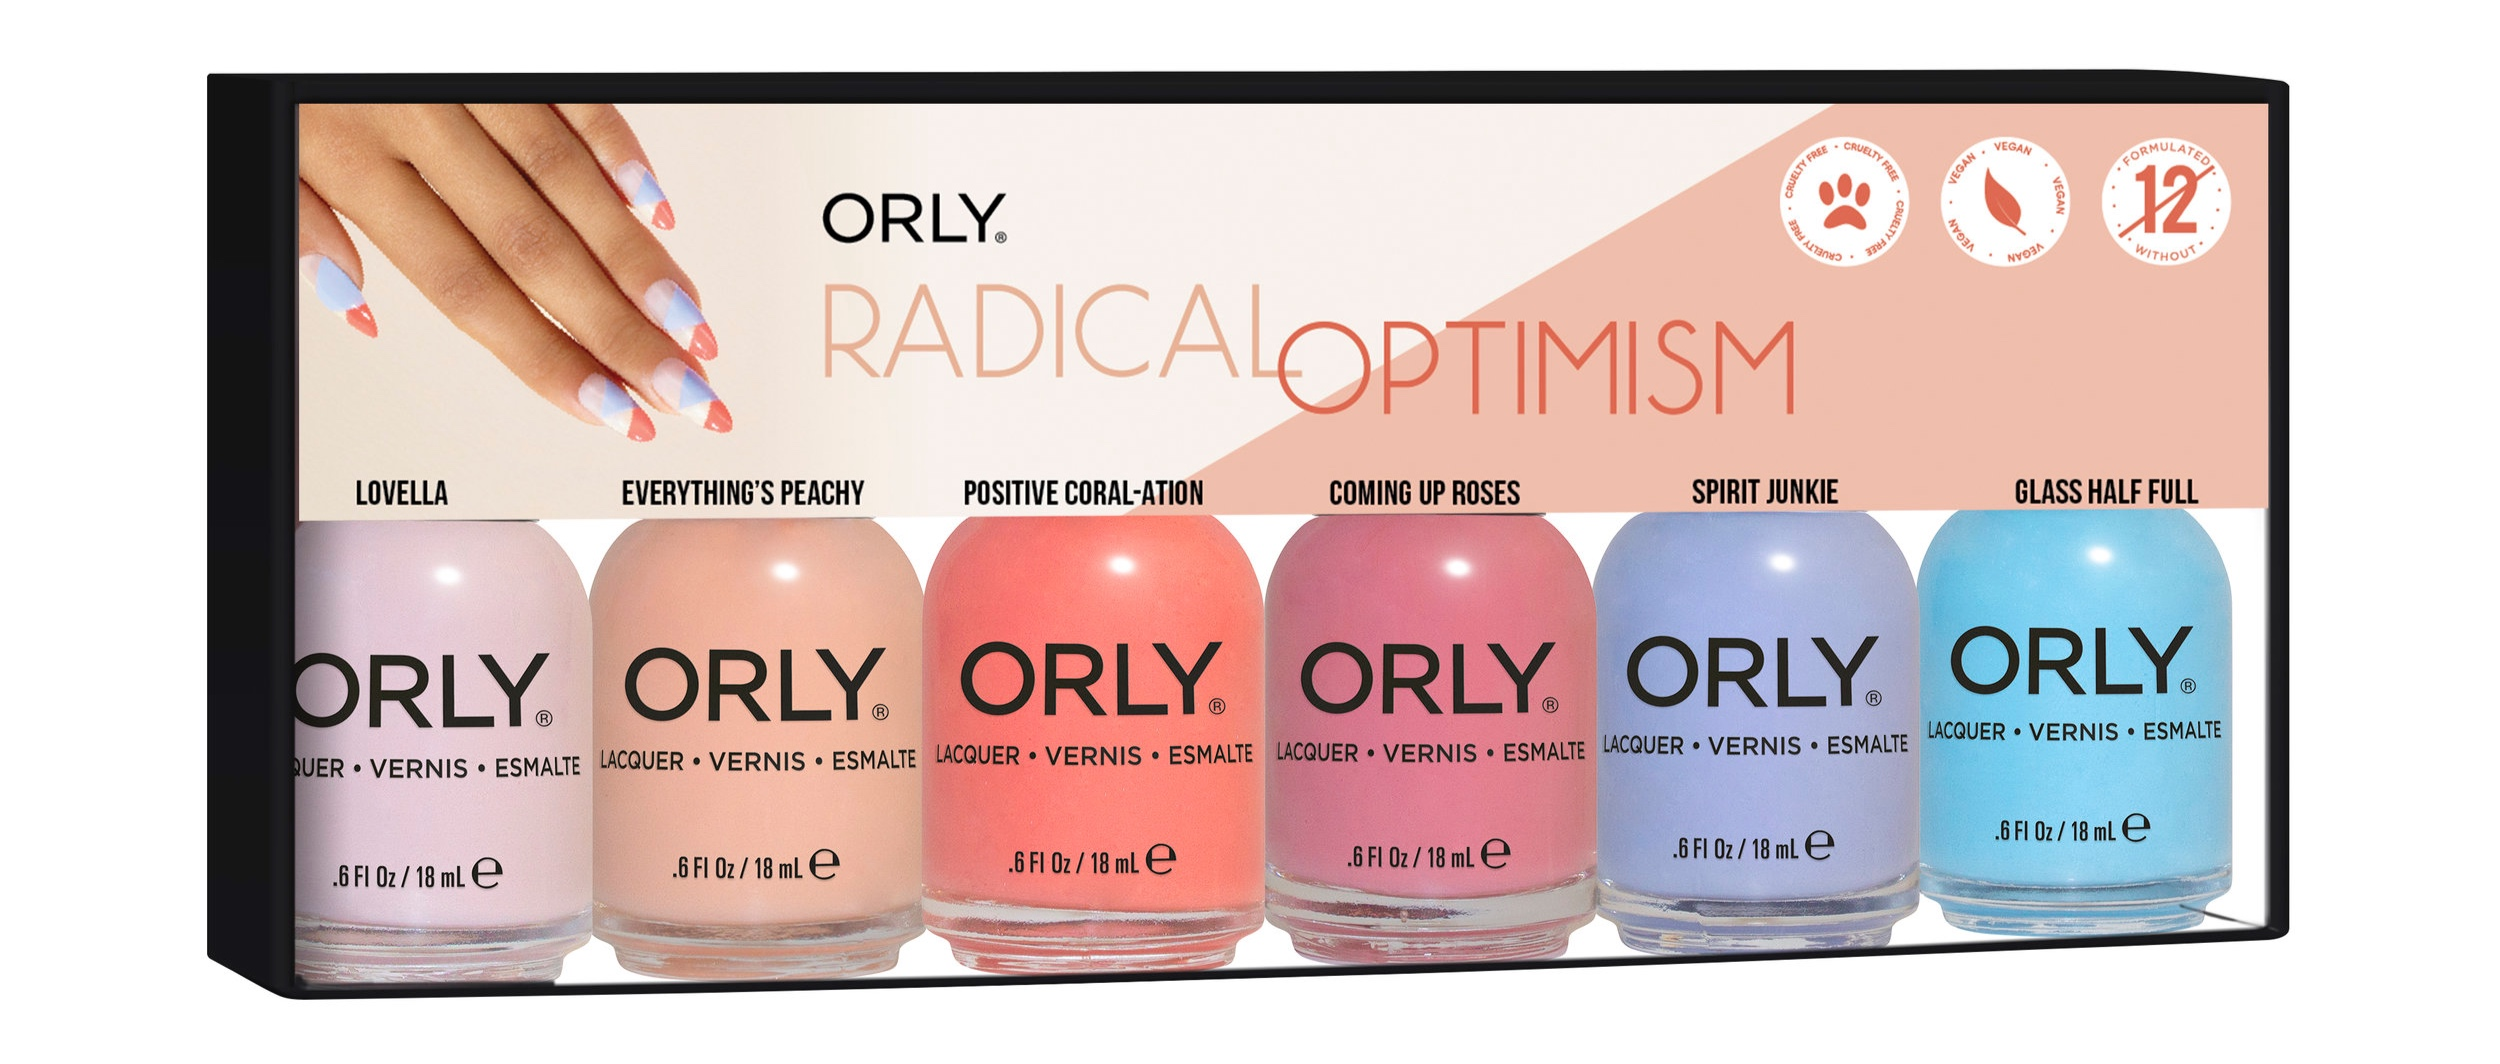 RadicalOptimism_6PIX_MockUp+copy.jpg